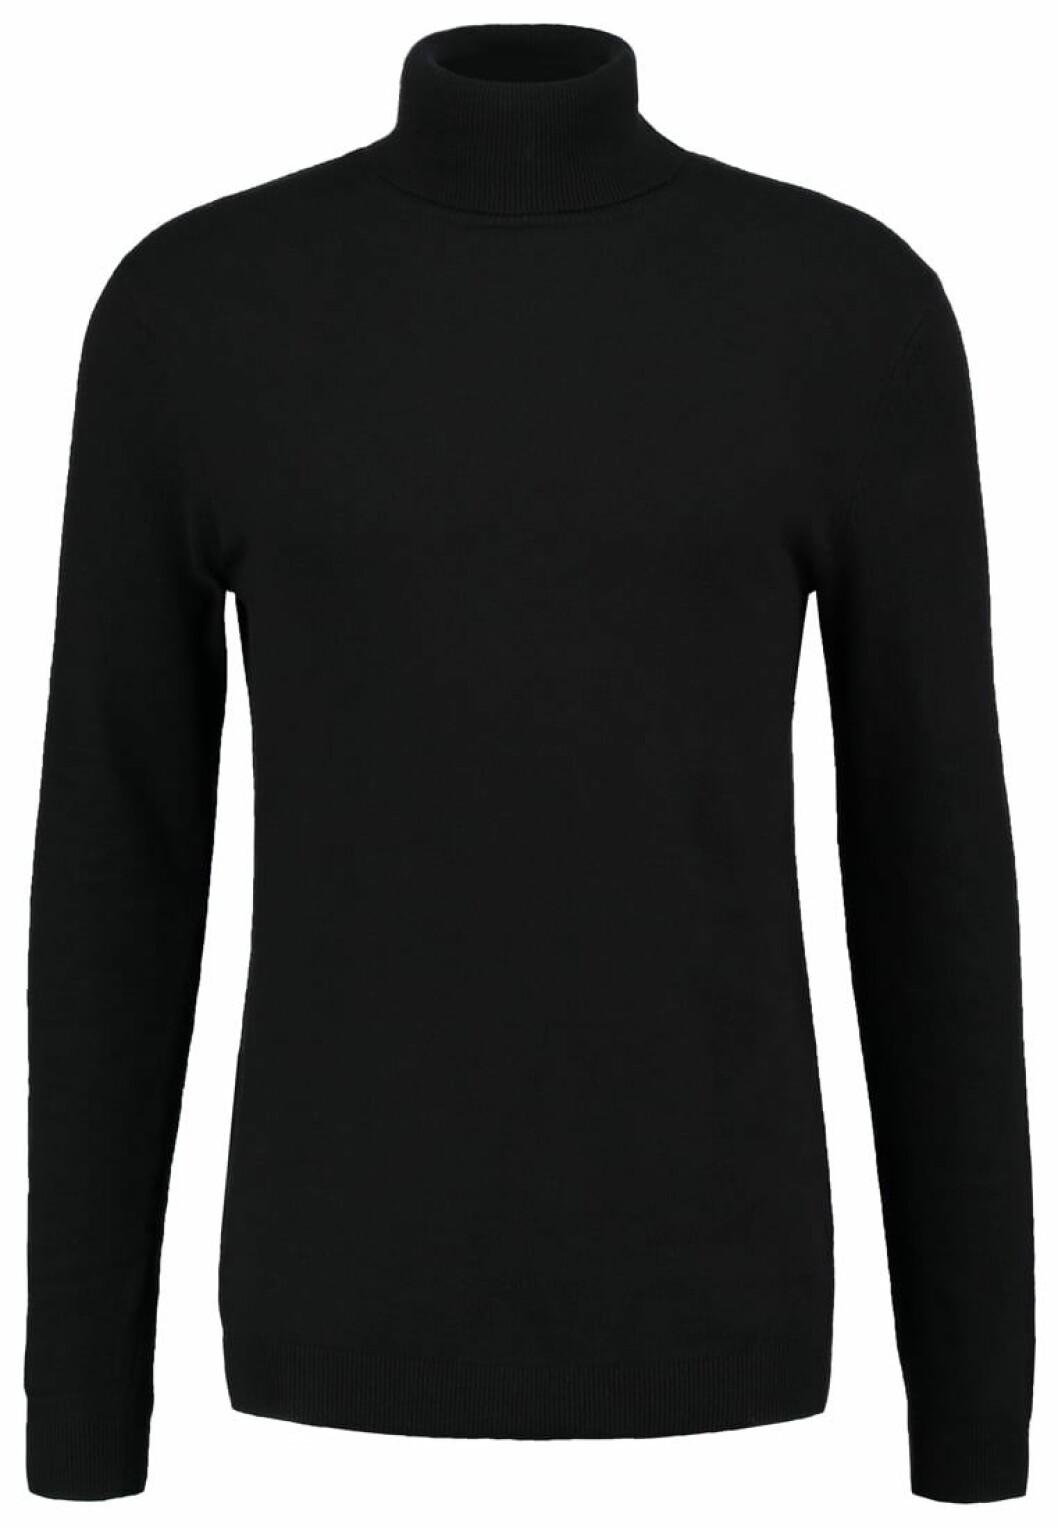 svart stickad polotroja man